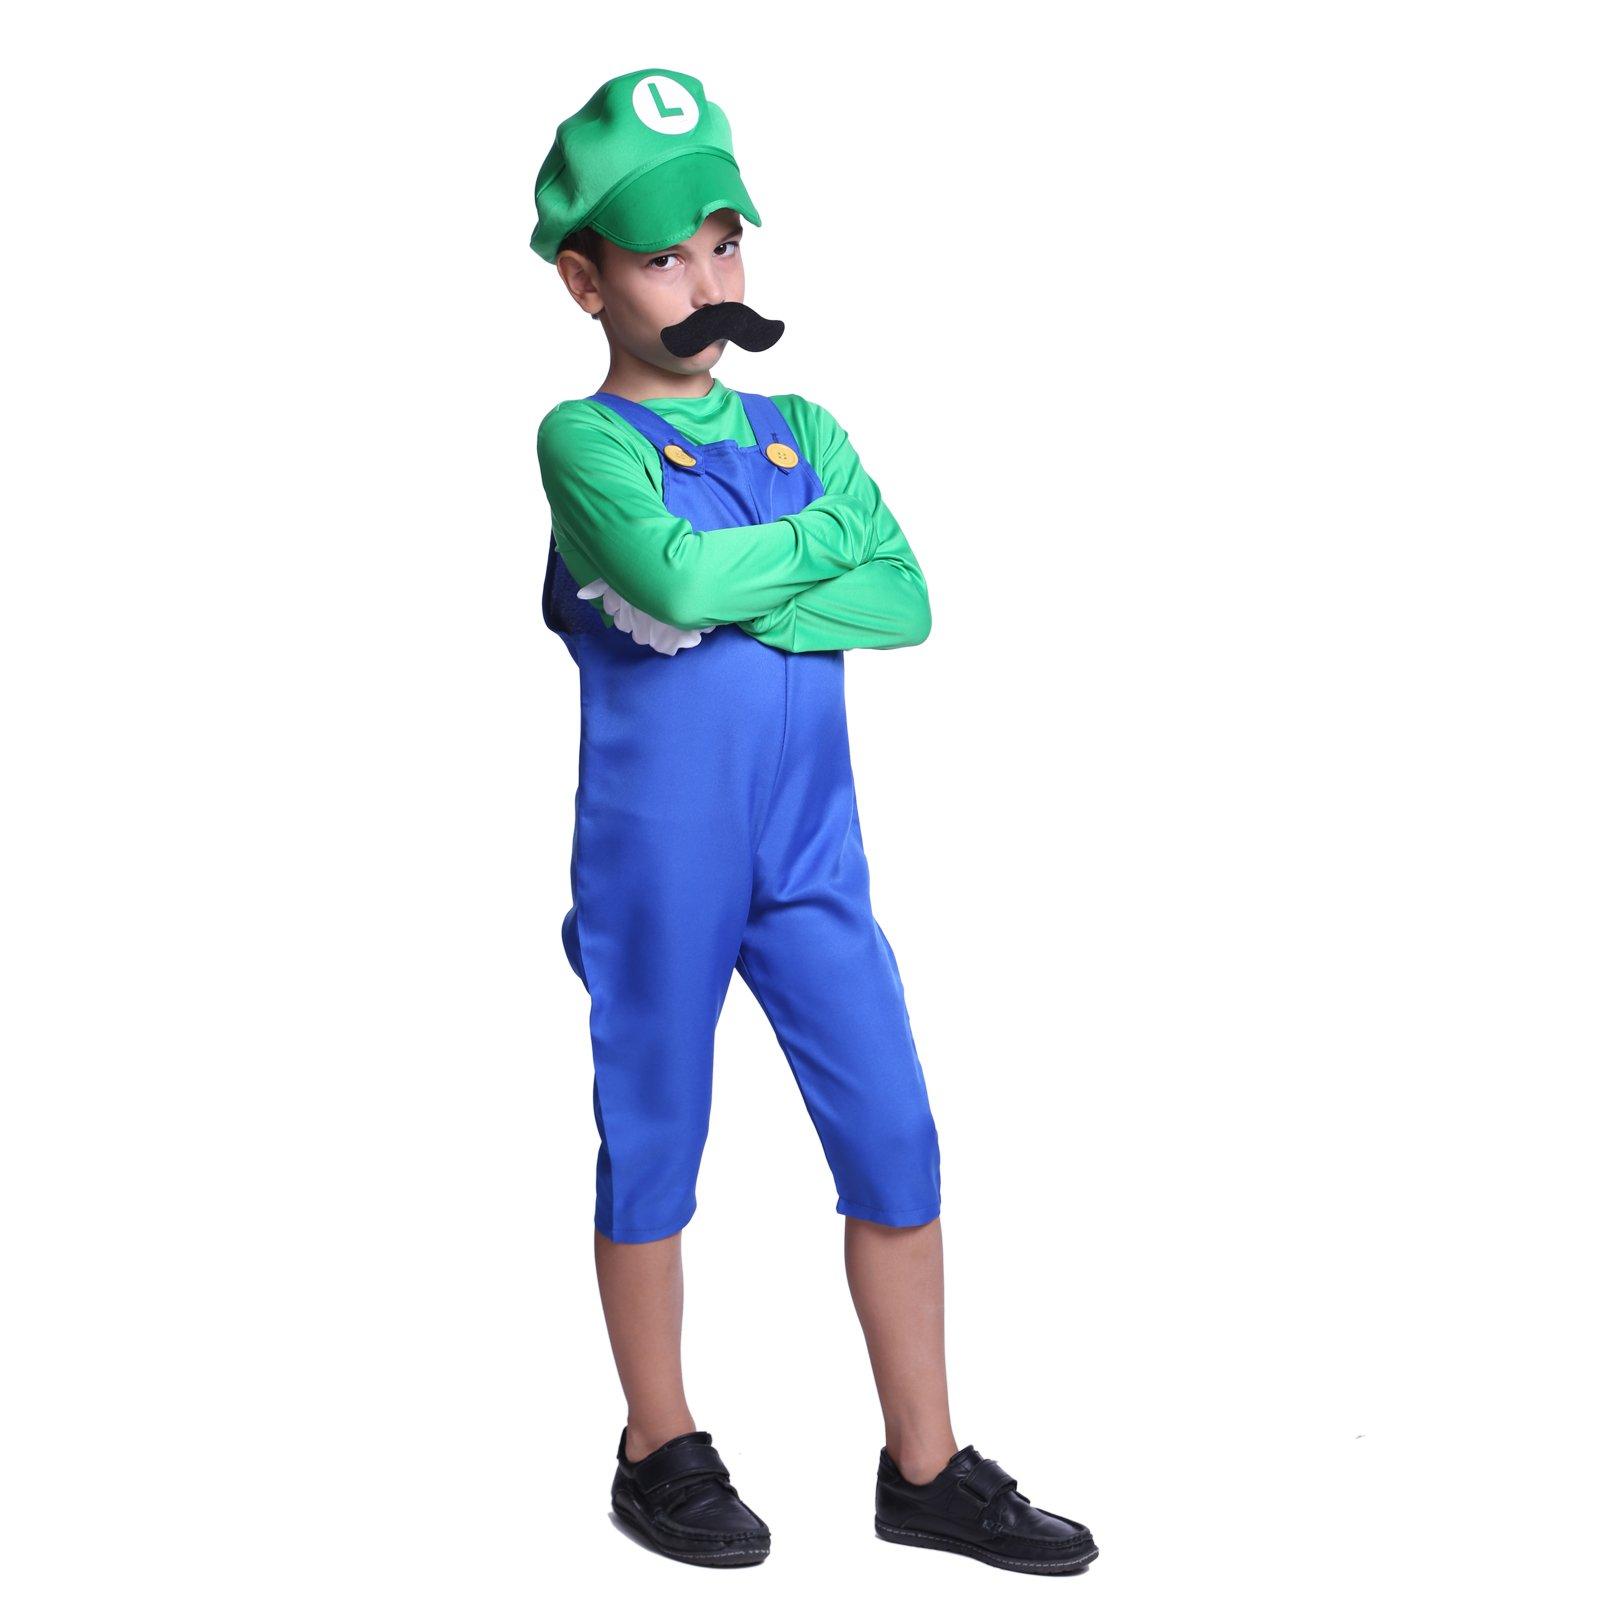 Boys Super Mario Luigi Plumber Bros Workmen Game Fancy Dress Costume Kids